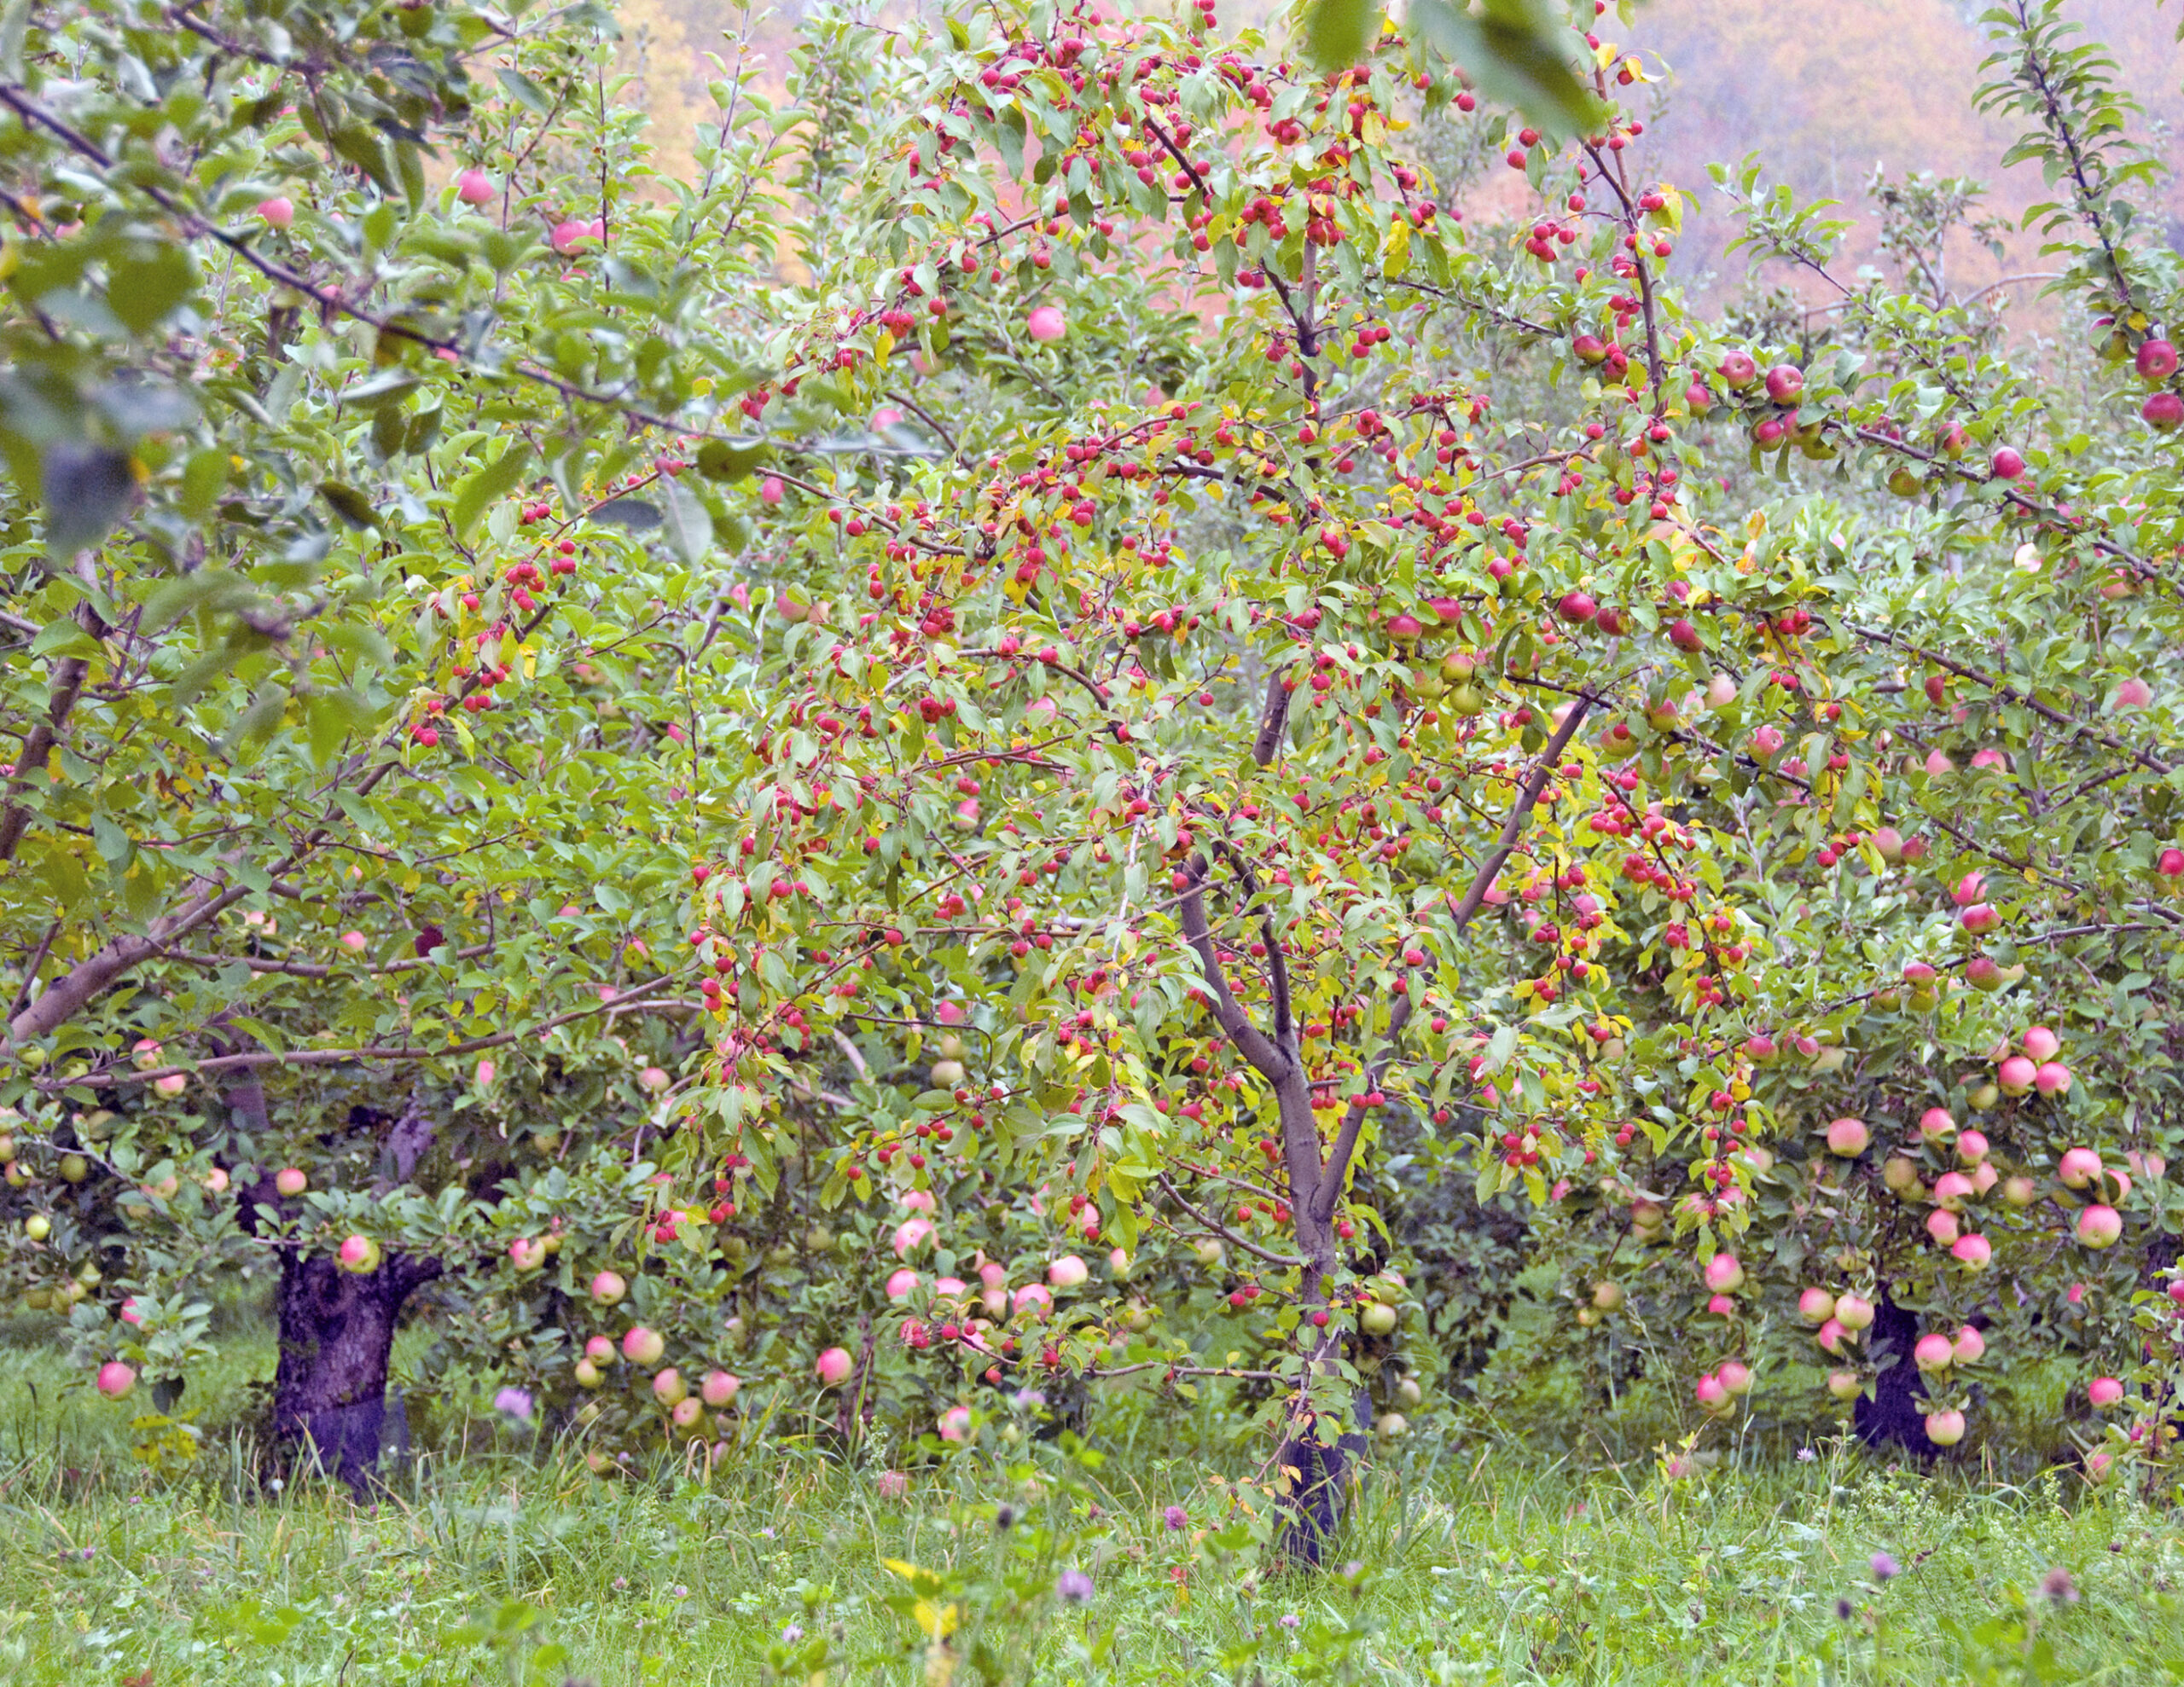 Scott Farm orchard before harvest